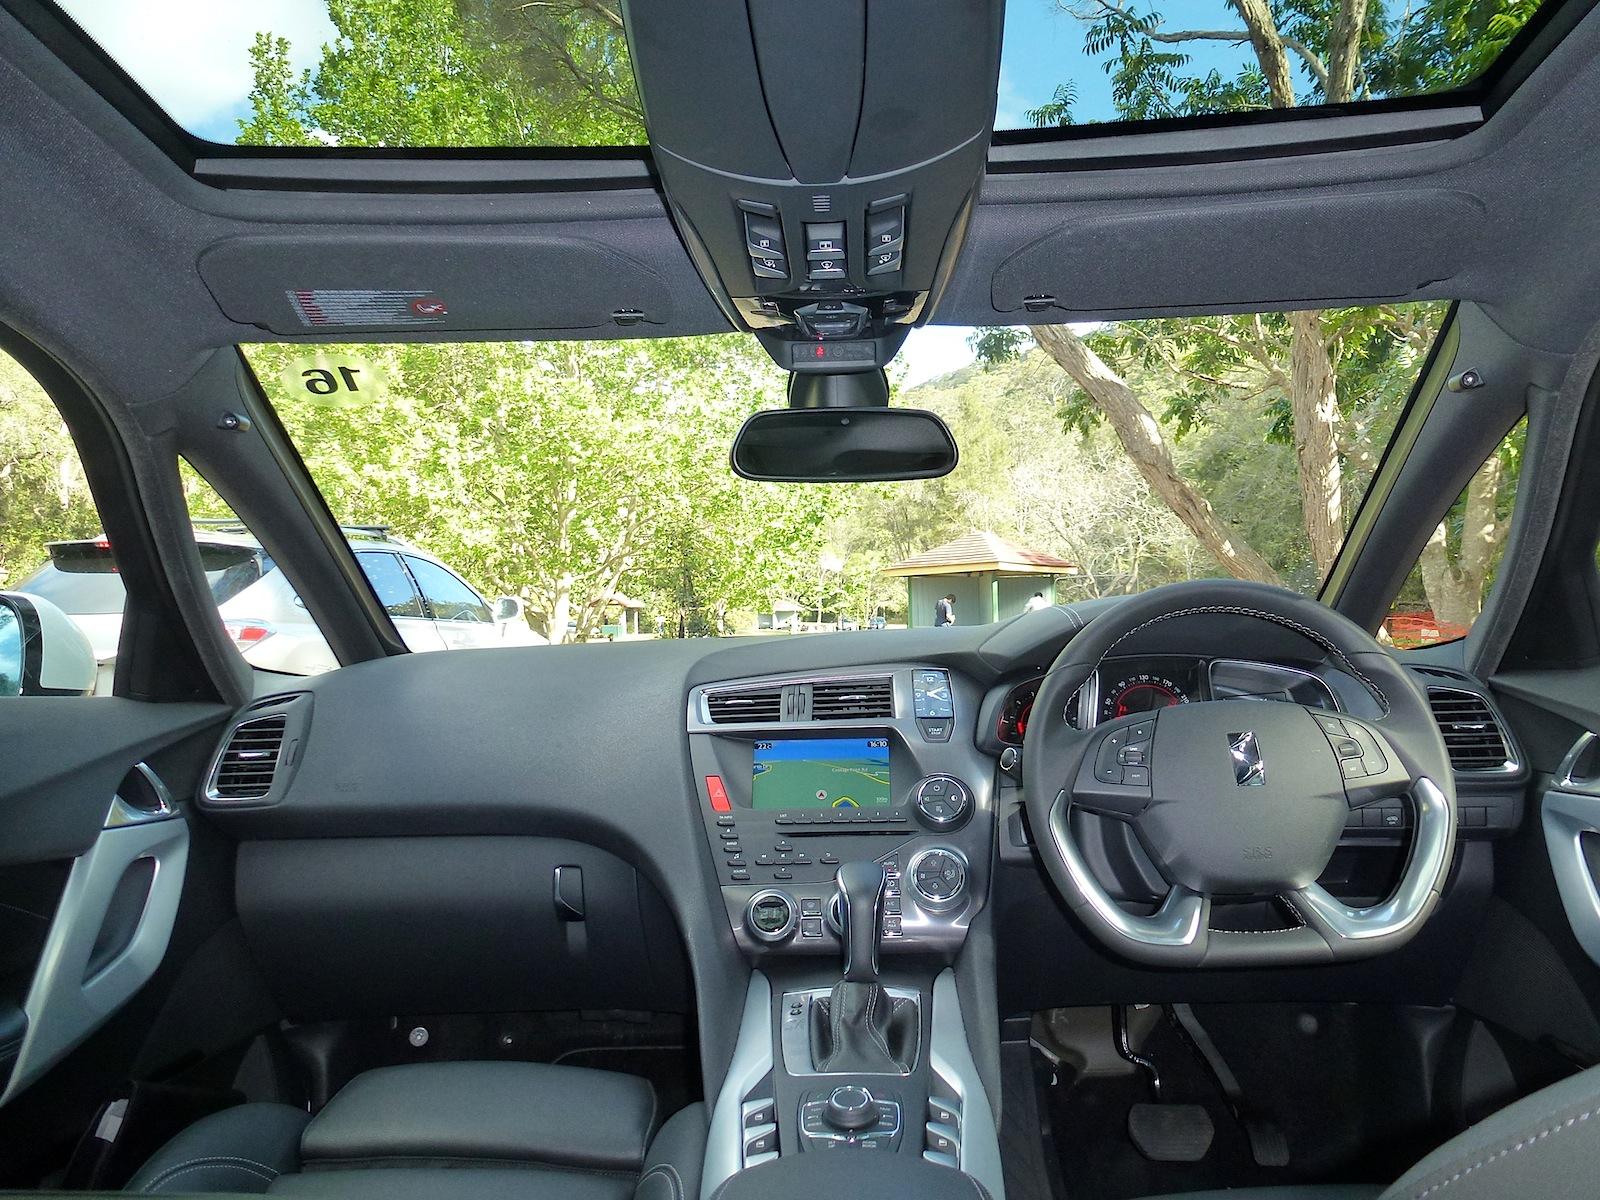 Citroen Ds5 Review Caradvice